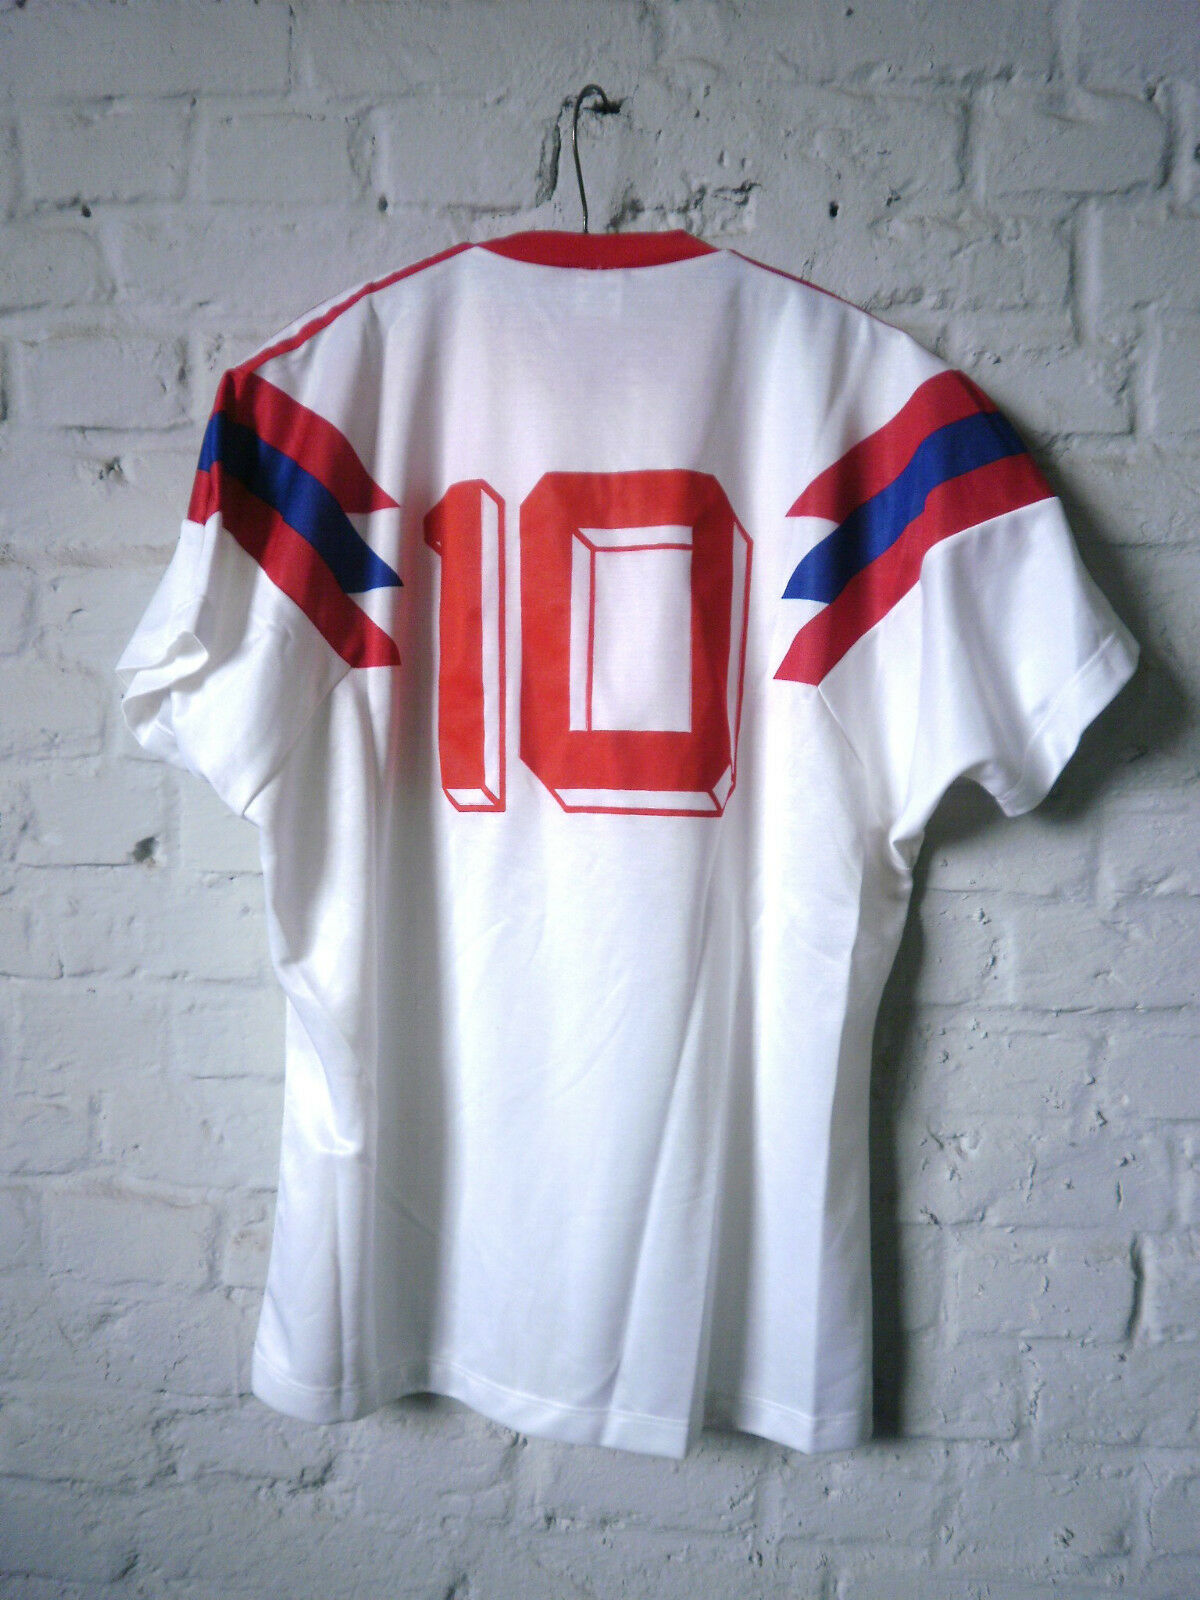 Adidas Trikot HERRENSPIELERHEMD Shirt Fußballshirt 70s NOS NOS NOS 80er True Vintage 80s 2ca7b1